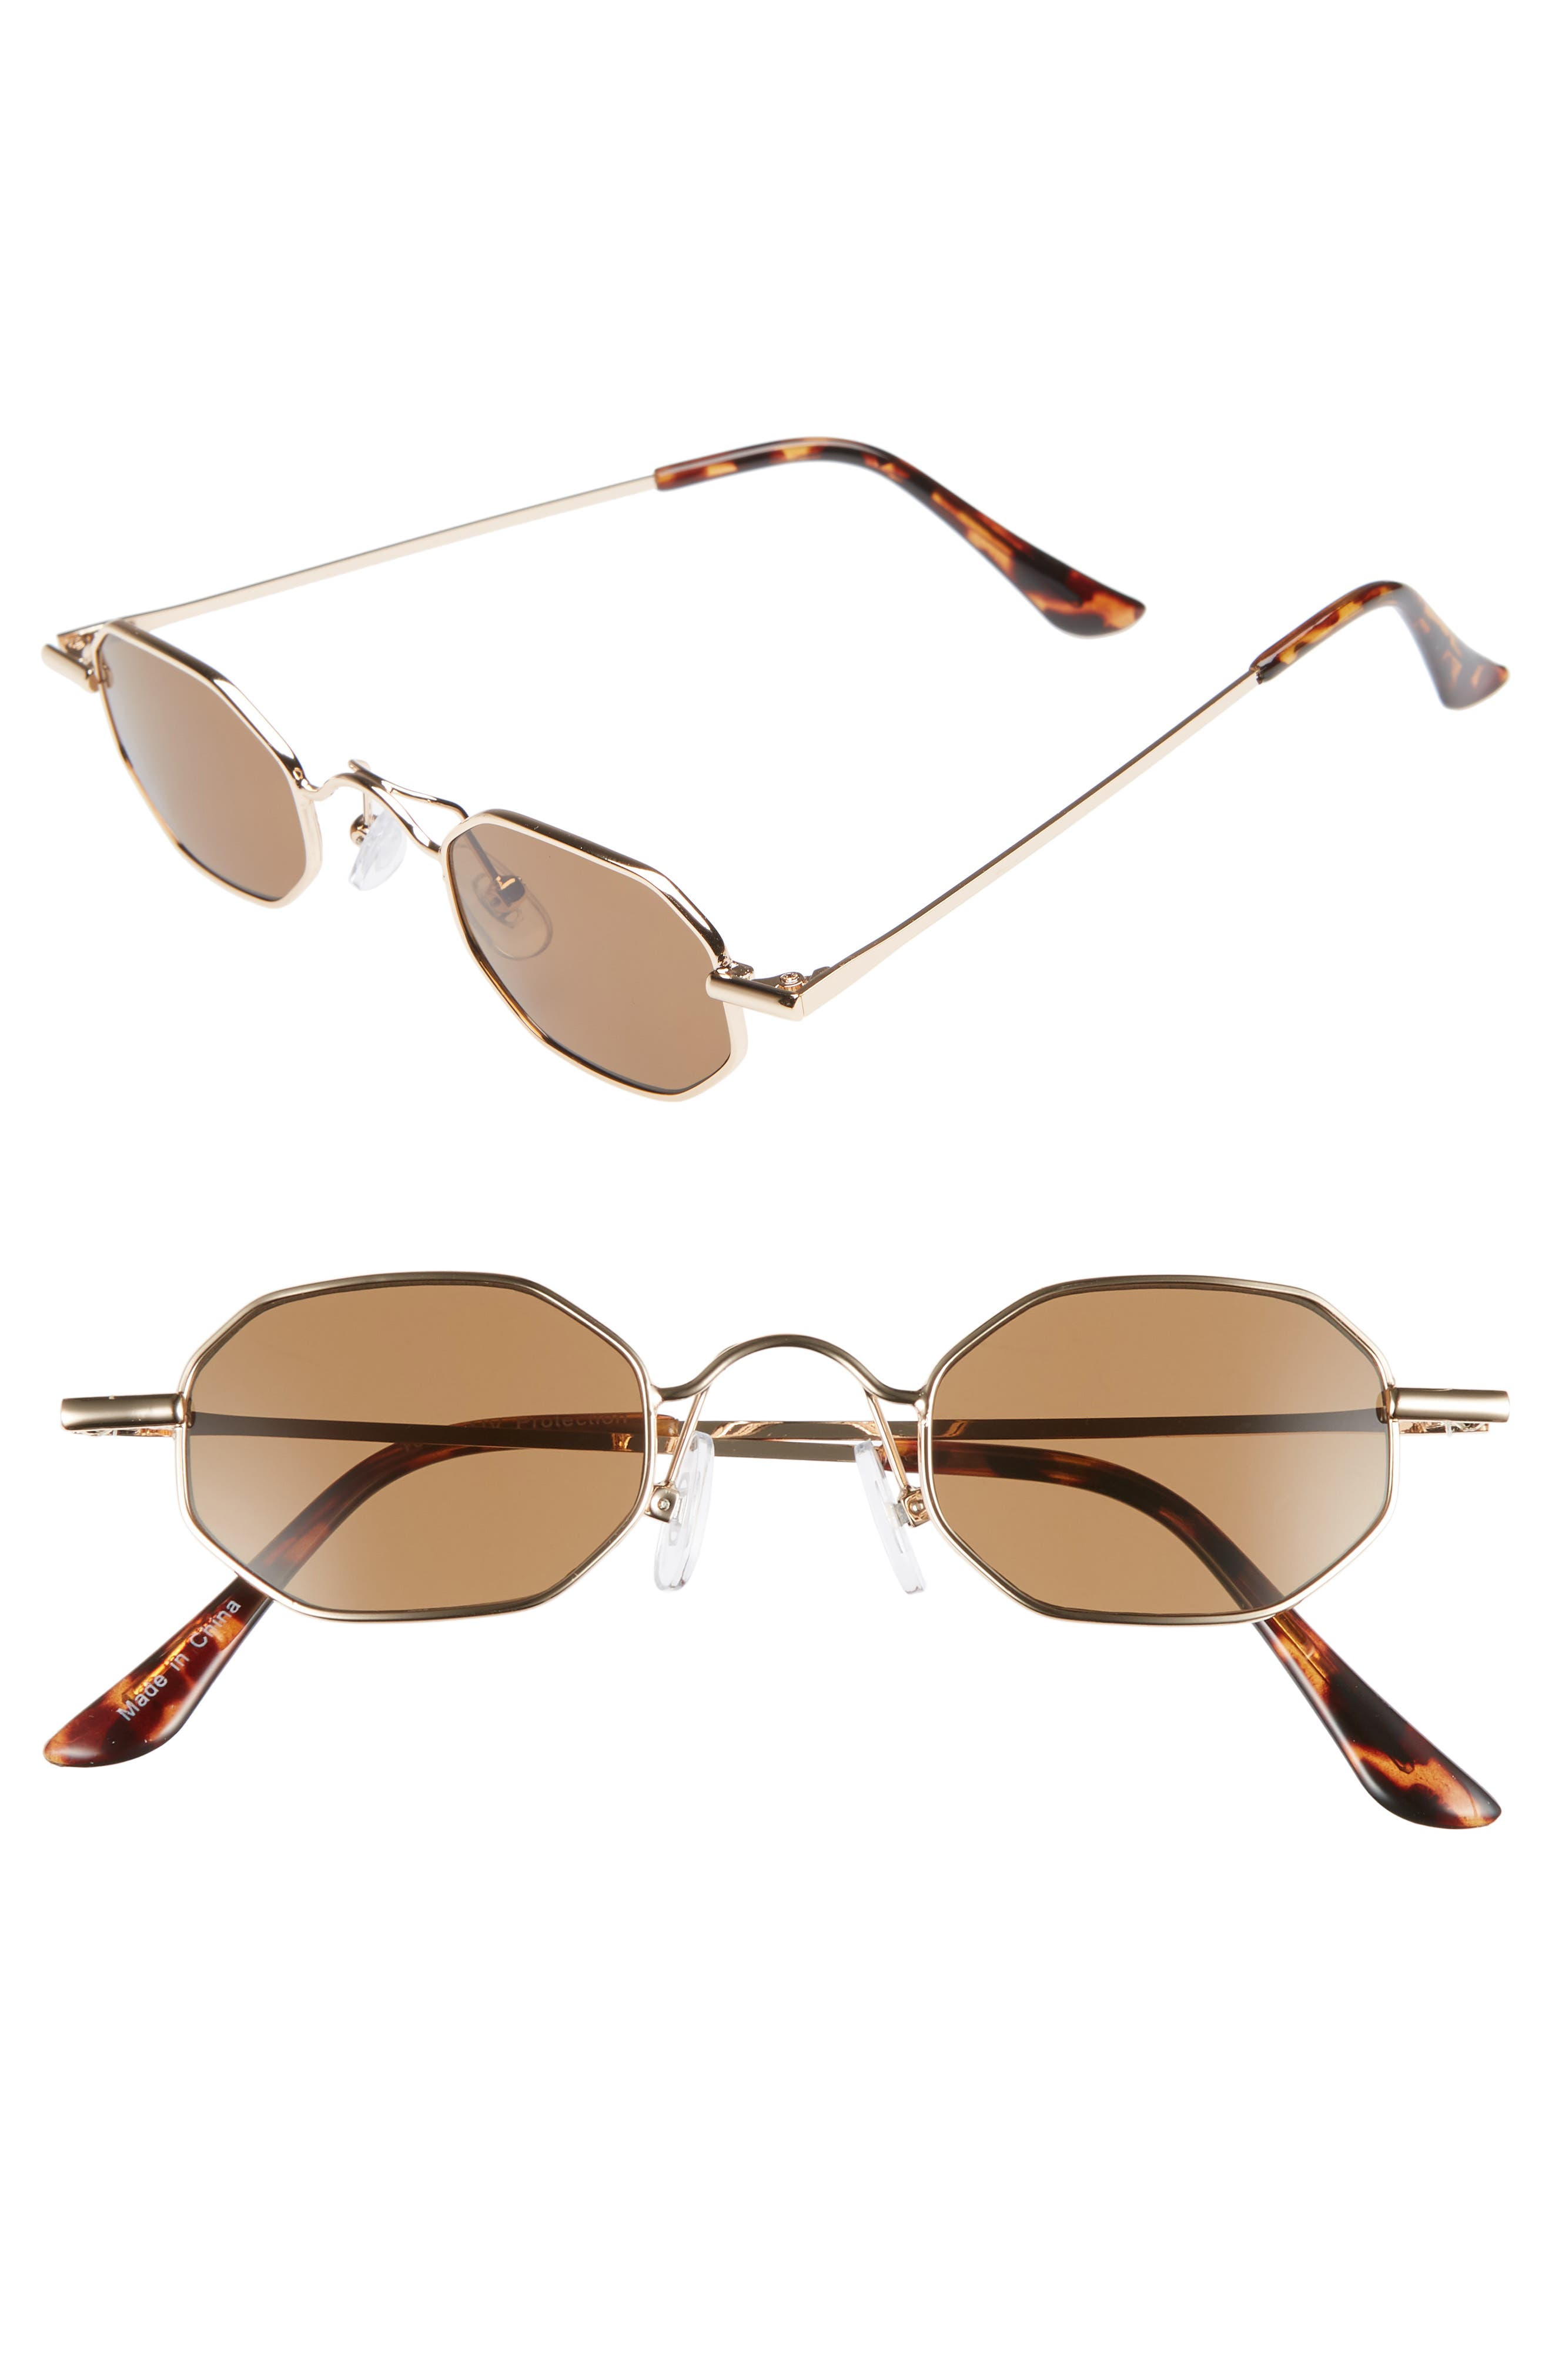 40mm Mini Hexagon Sunglasses,                             Main thumbnail 1, color,                             BROWN GOLD